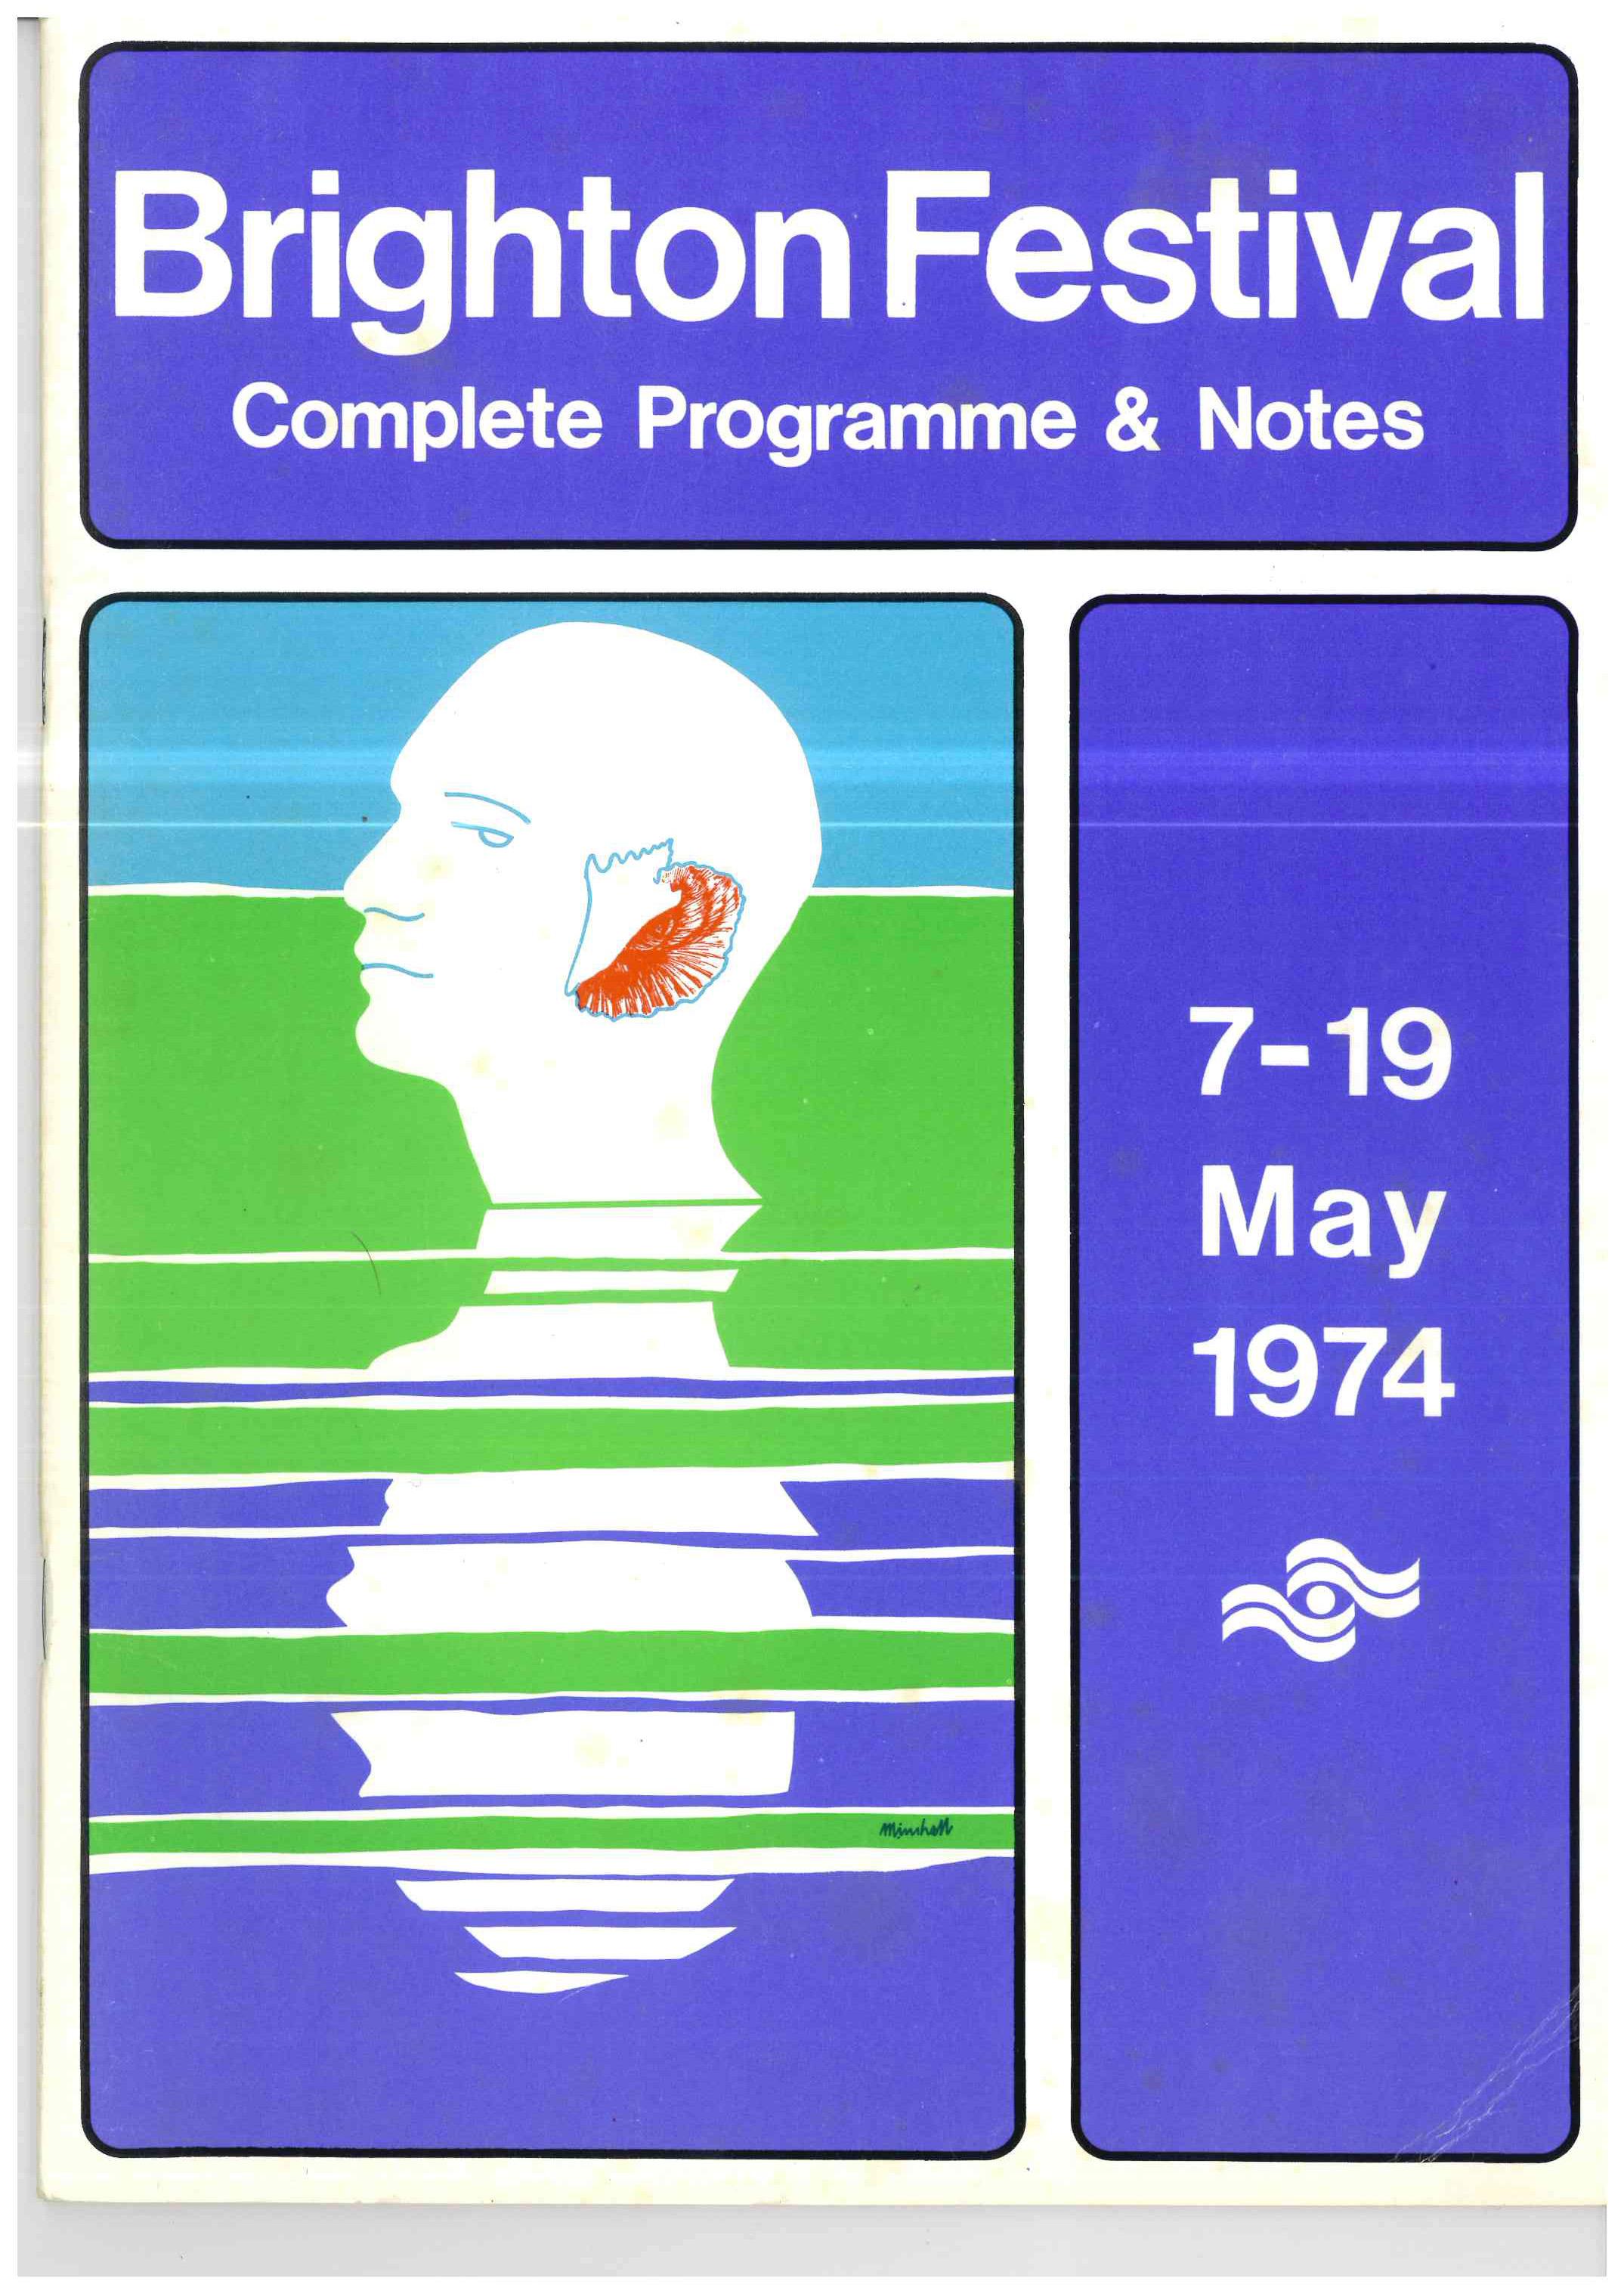 00095-BYO Brighton Festival 1974.jpg